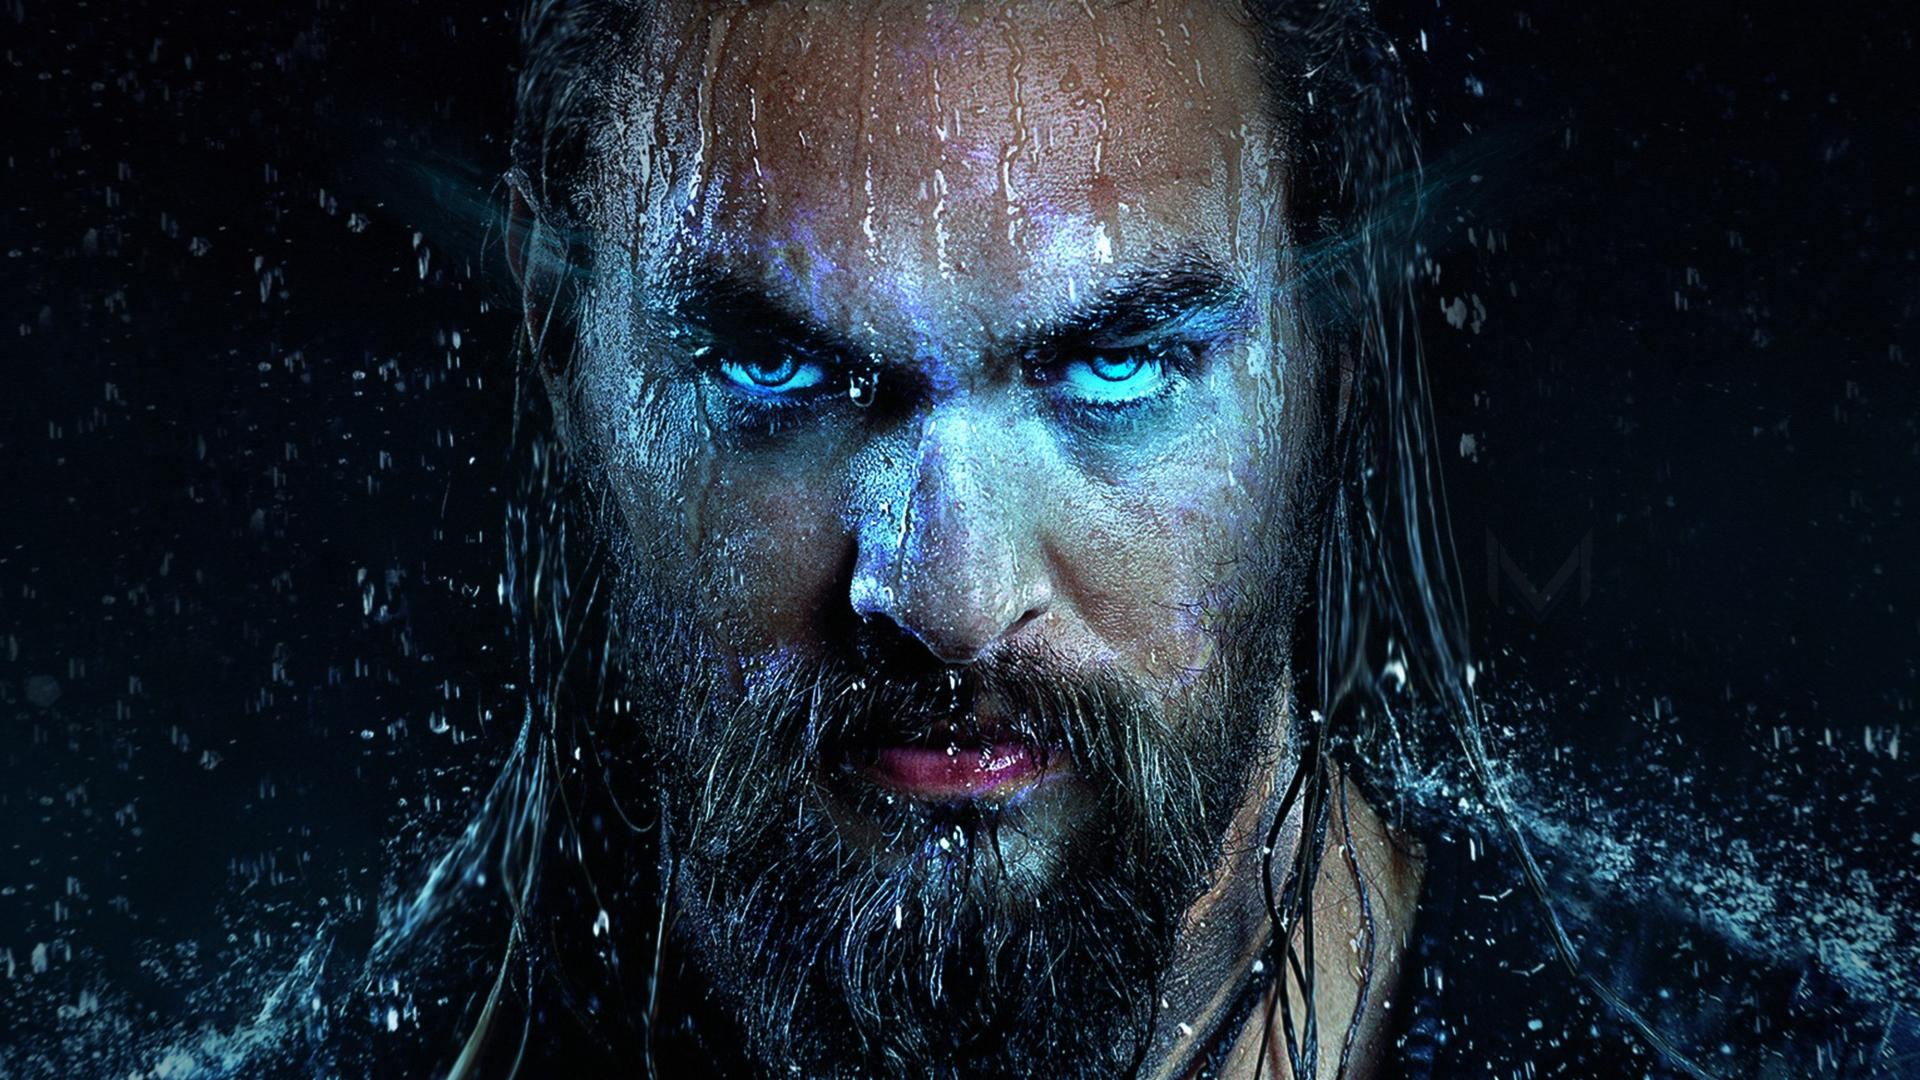 Aquaman Movie Free Download In Hindi In 1080: Download 1920x1080 Wallpaper Aquaman, Movie, Jason Momoa